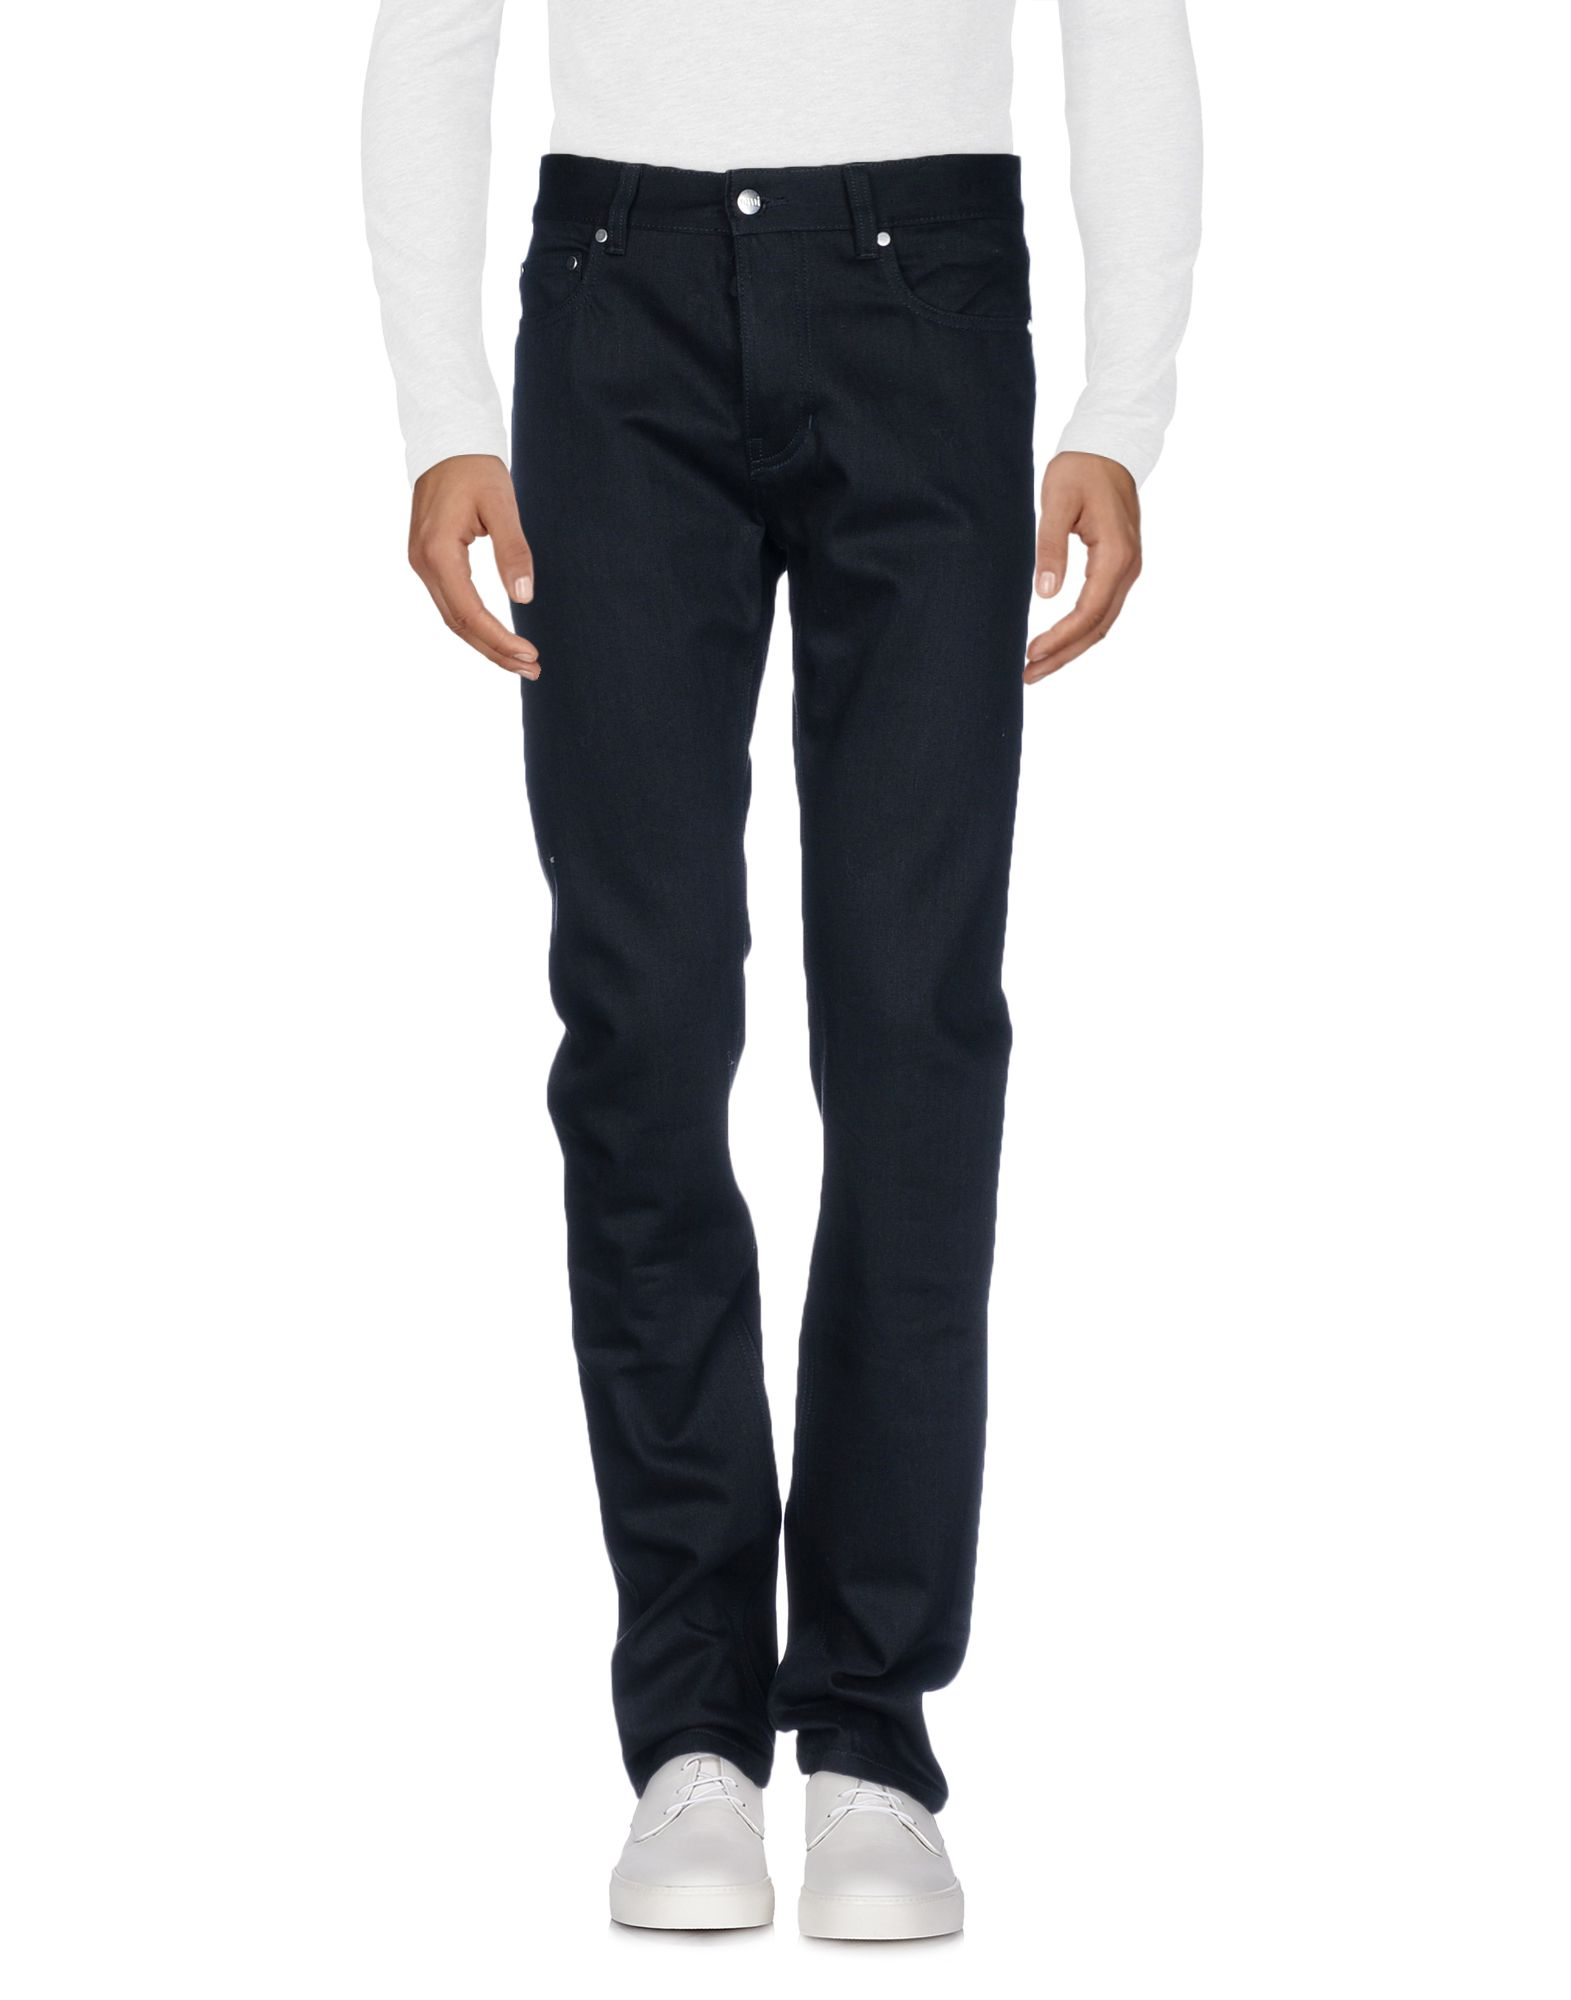 Pantaloni Jeans Ami - Alexandre Mattiussi Uomo - Ami 42679906EM a5e368